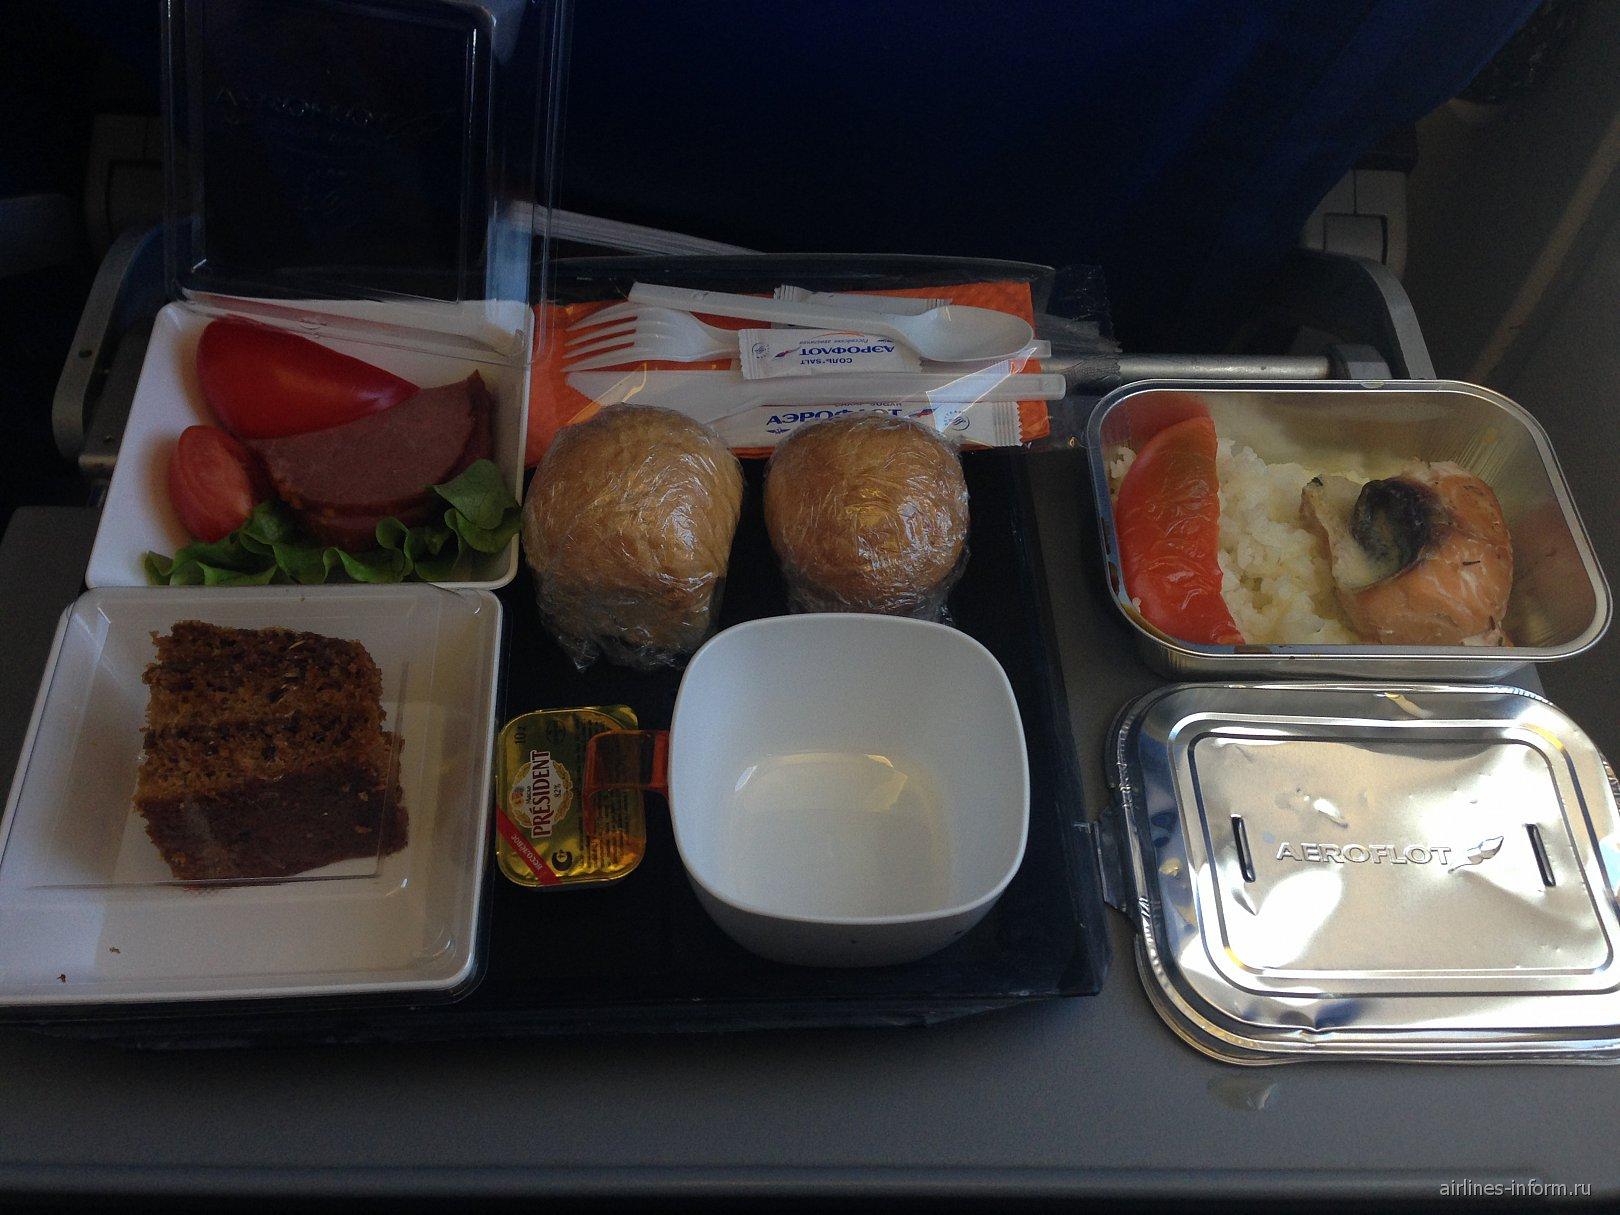 Питание на рейсе Аэрофлота Благовещенск-Москва